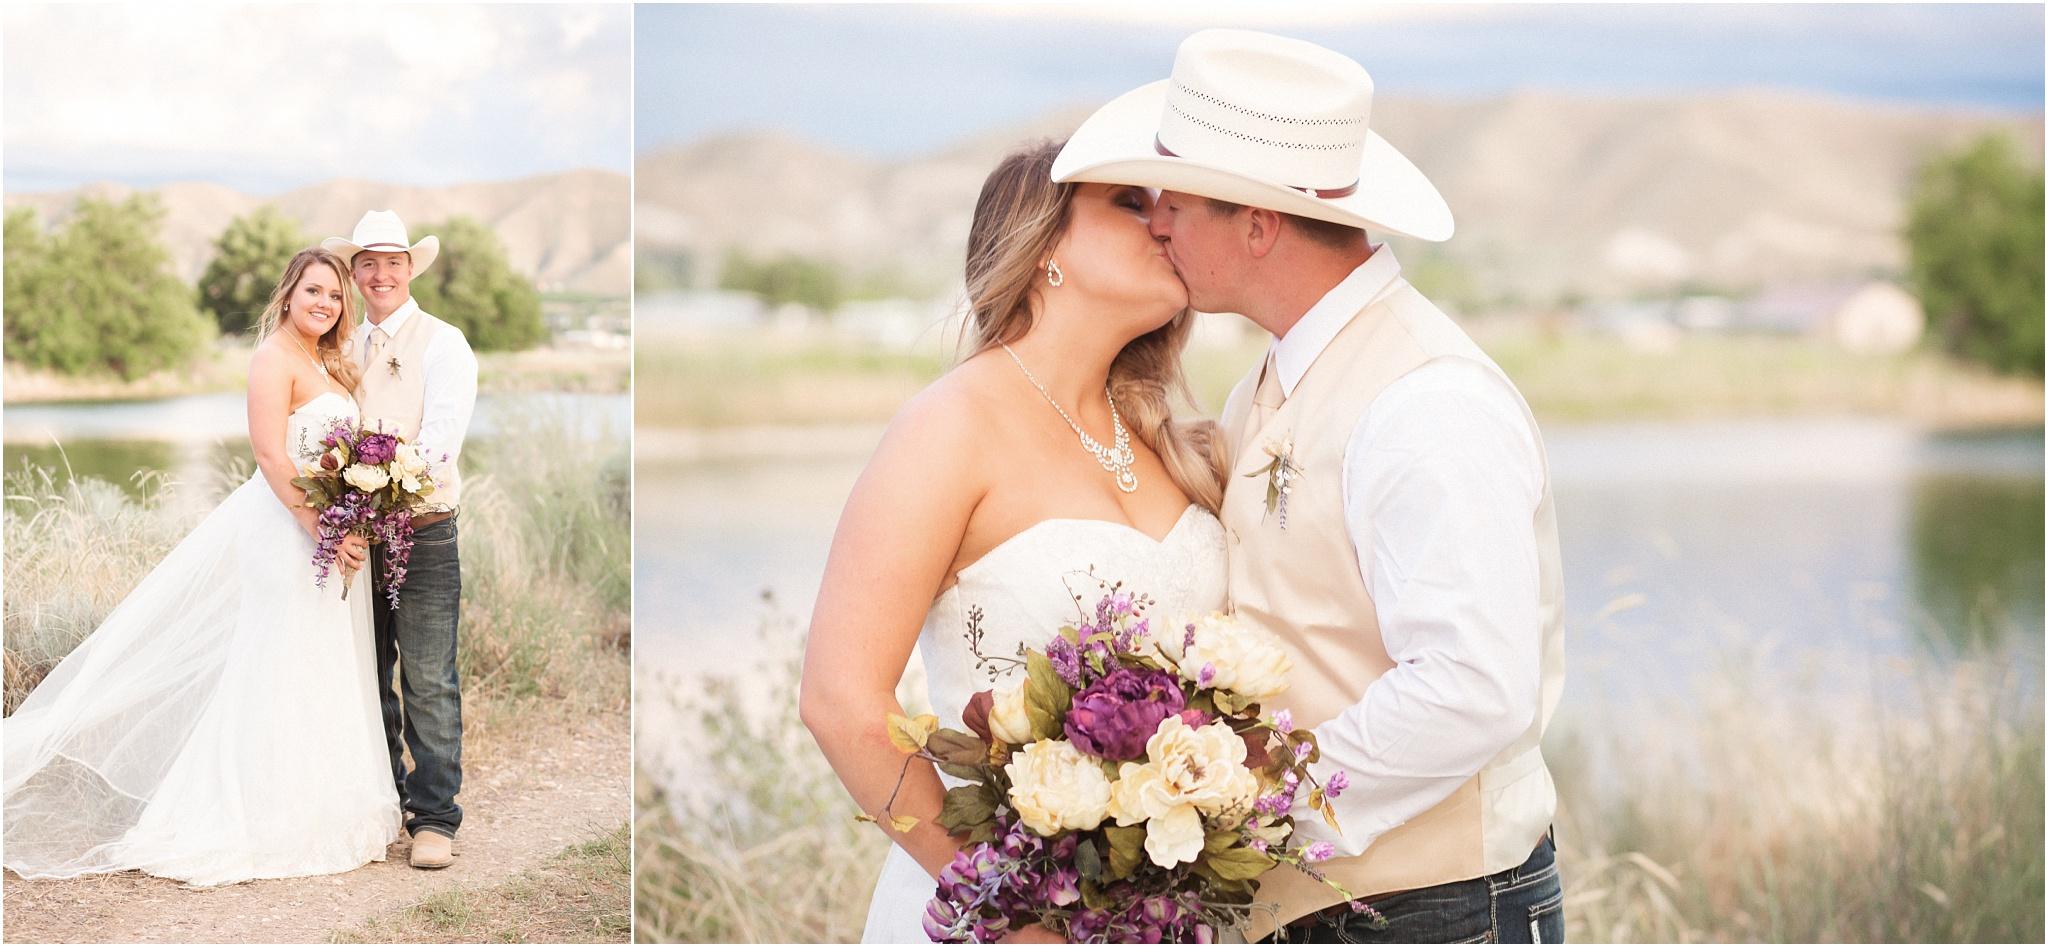 Wedding Photography_Emmett Idaho_Boise Idaho_Leah Southwick Photography_0050.jpg